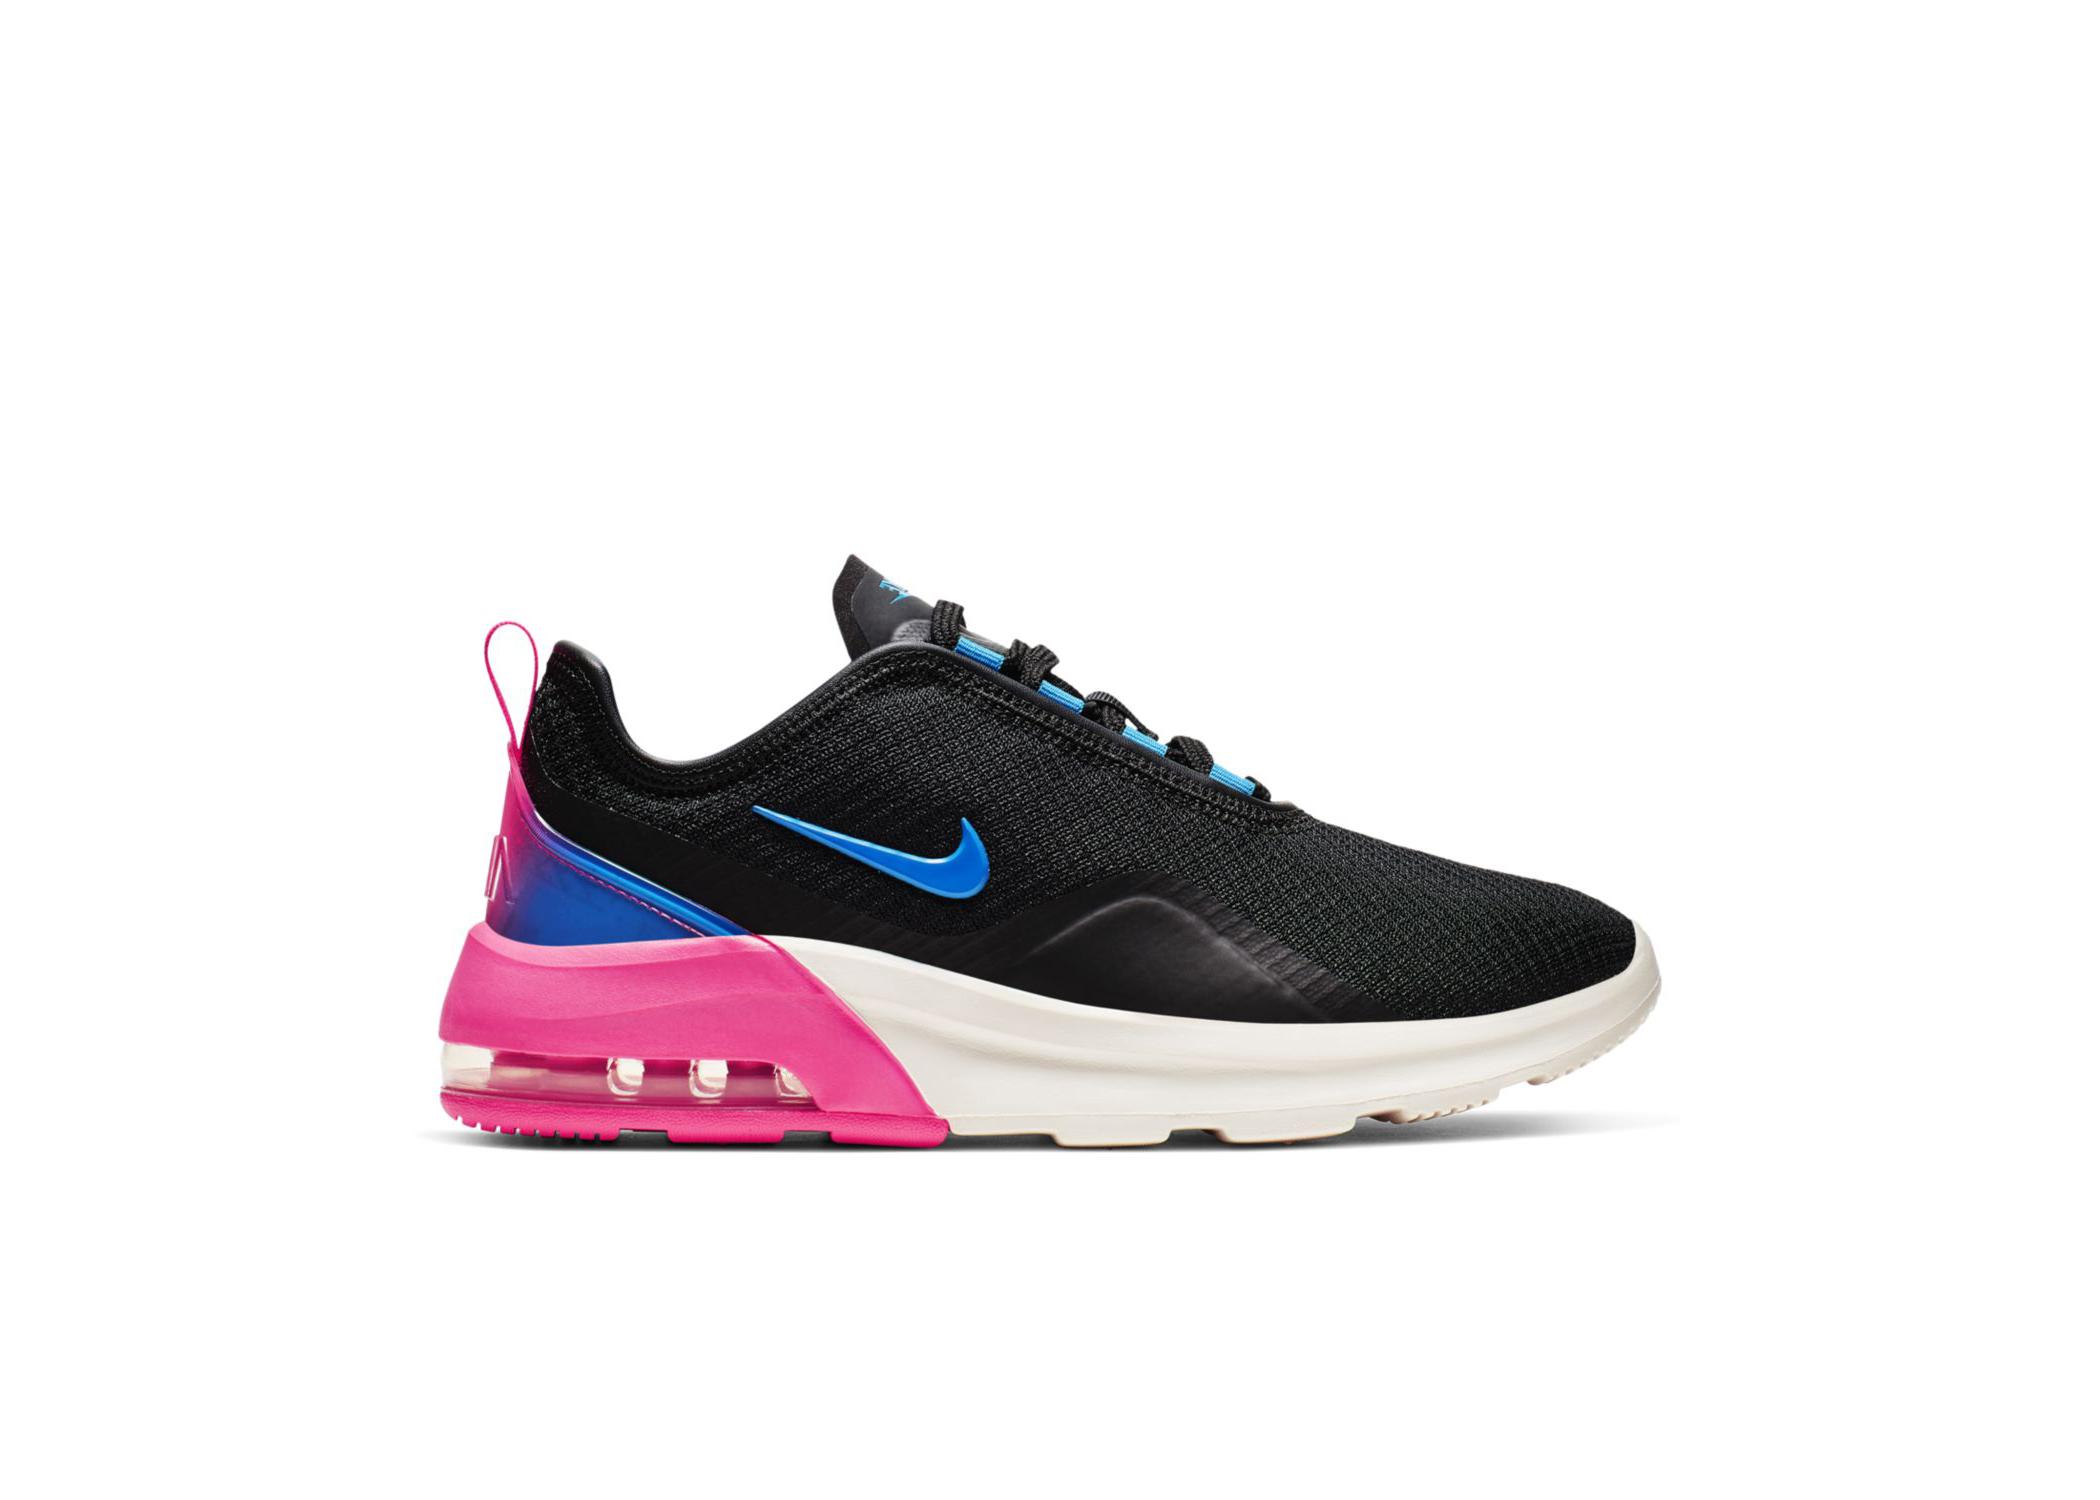 Nike Air Max Motion 2 Black Hyper Pink